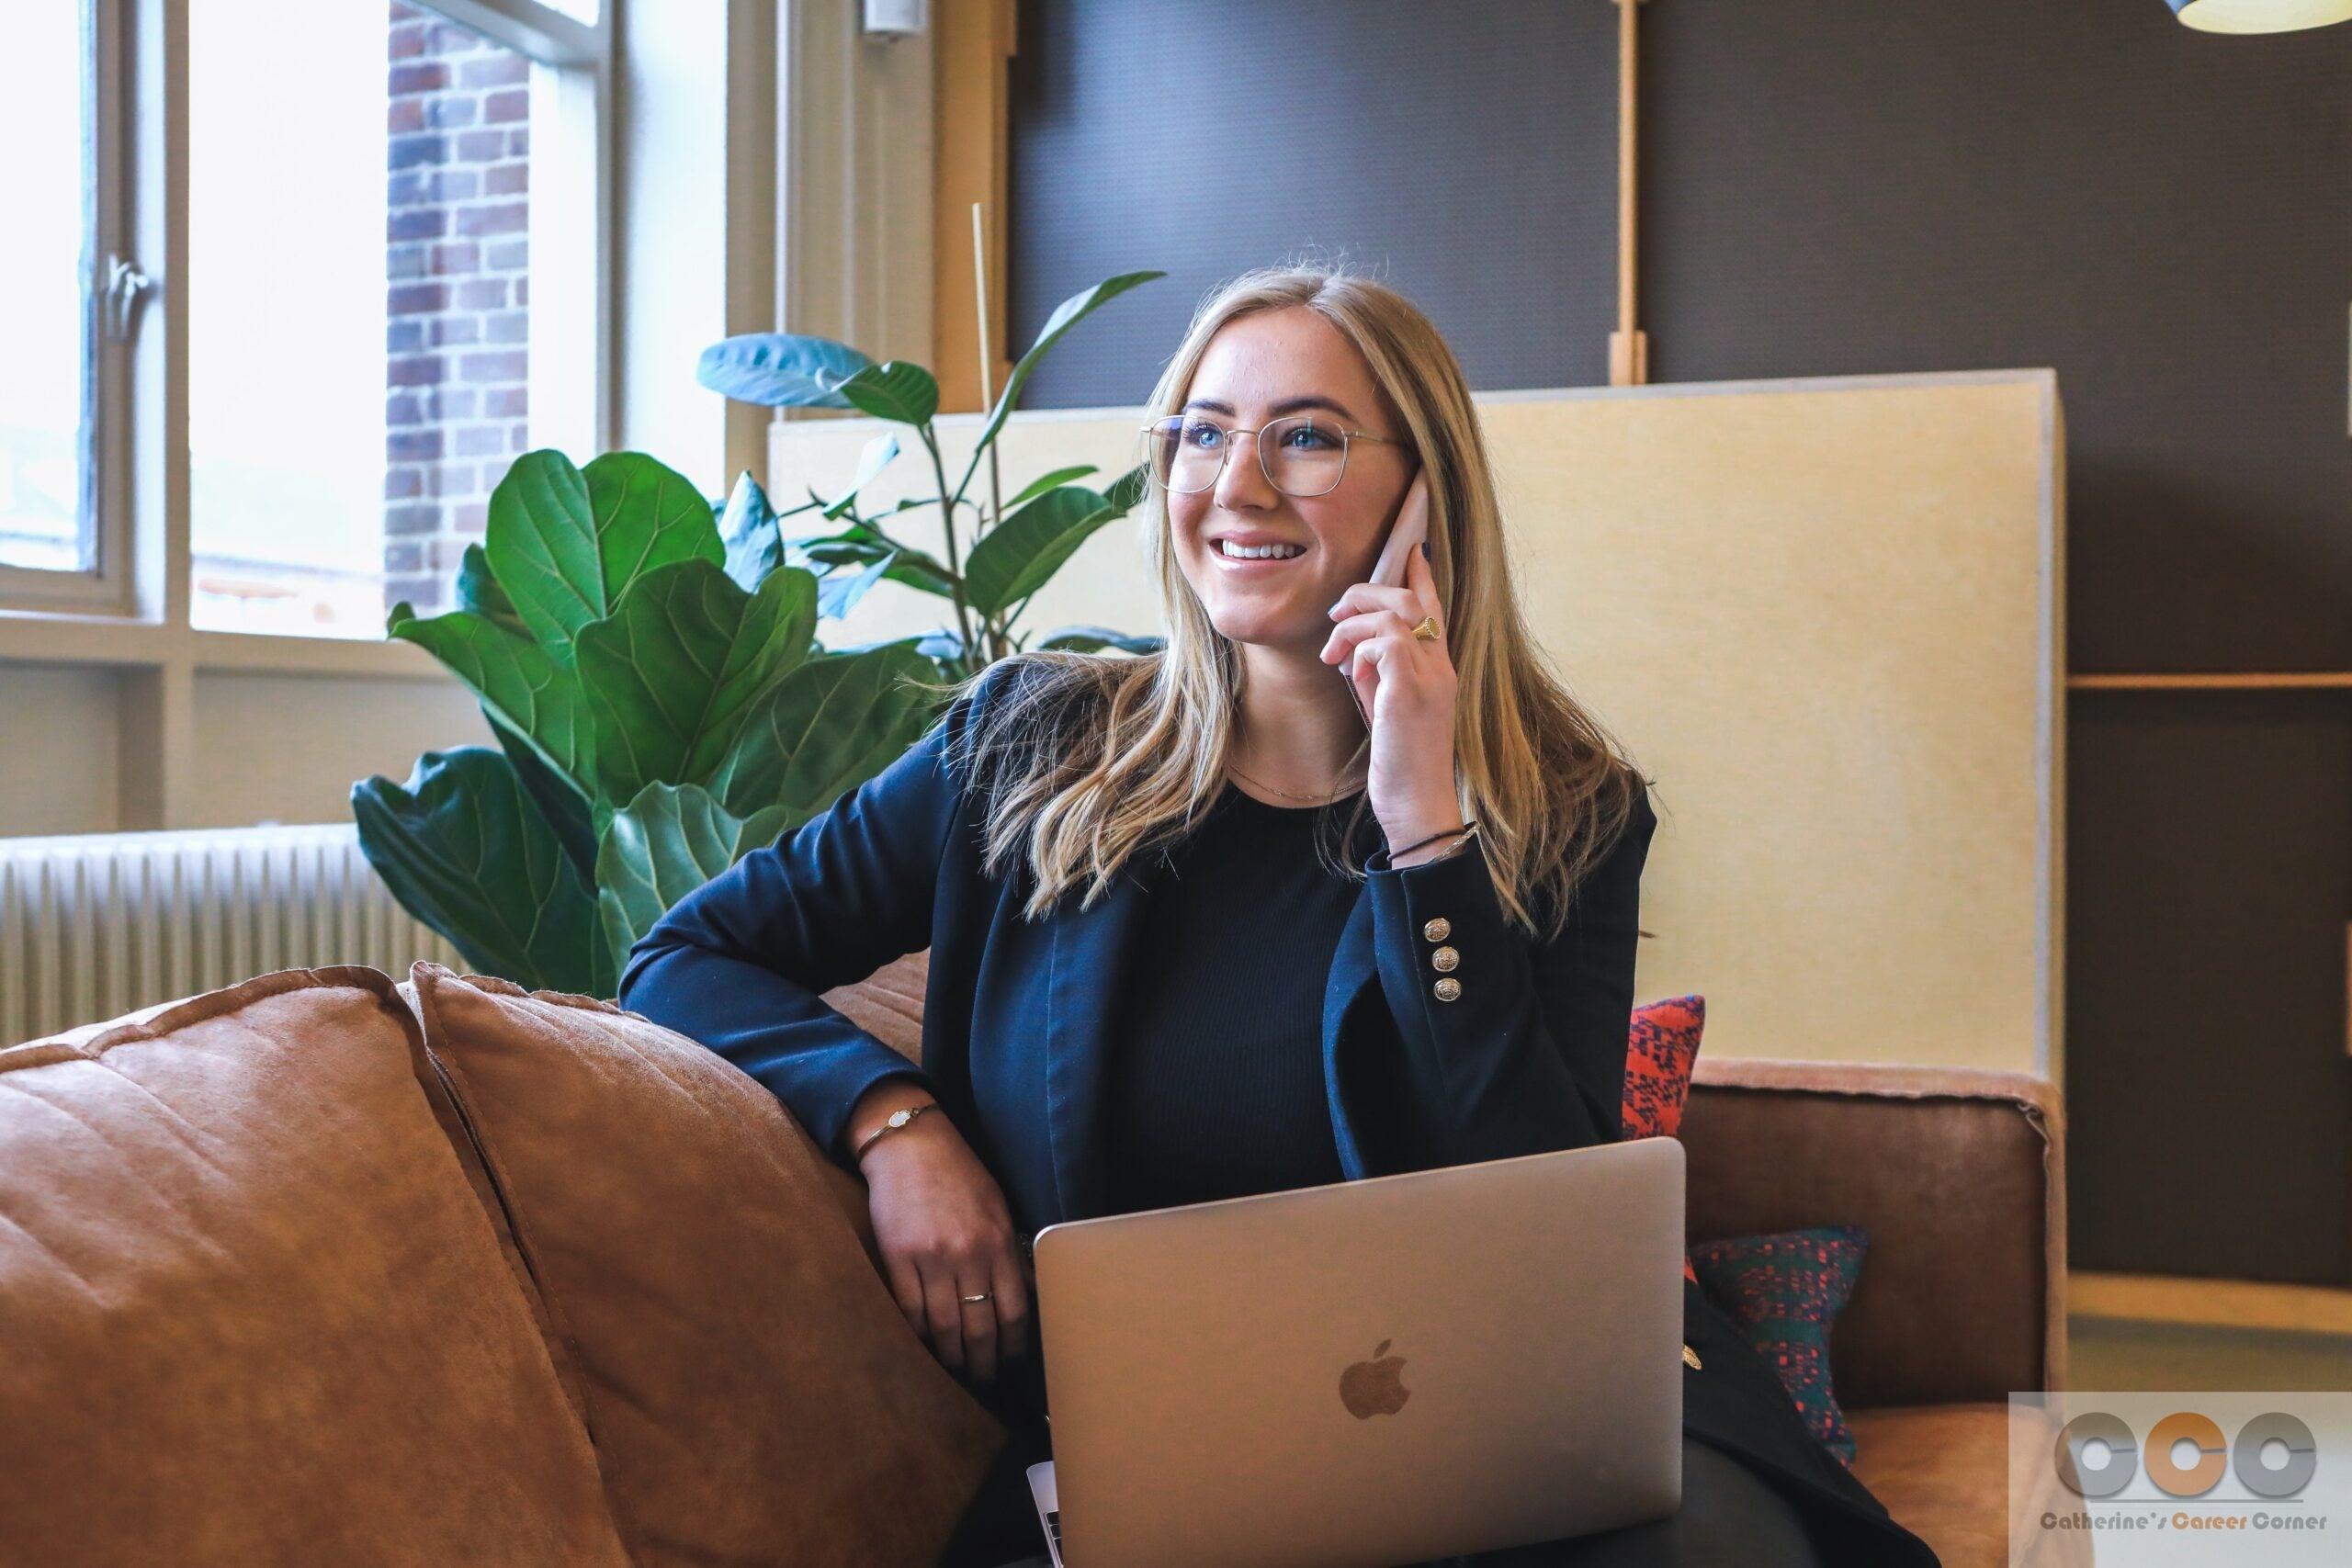 Network_Tips for Women to Improve Career Development